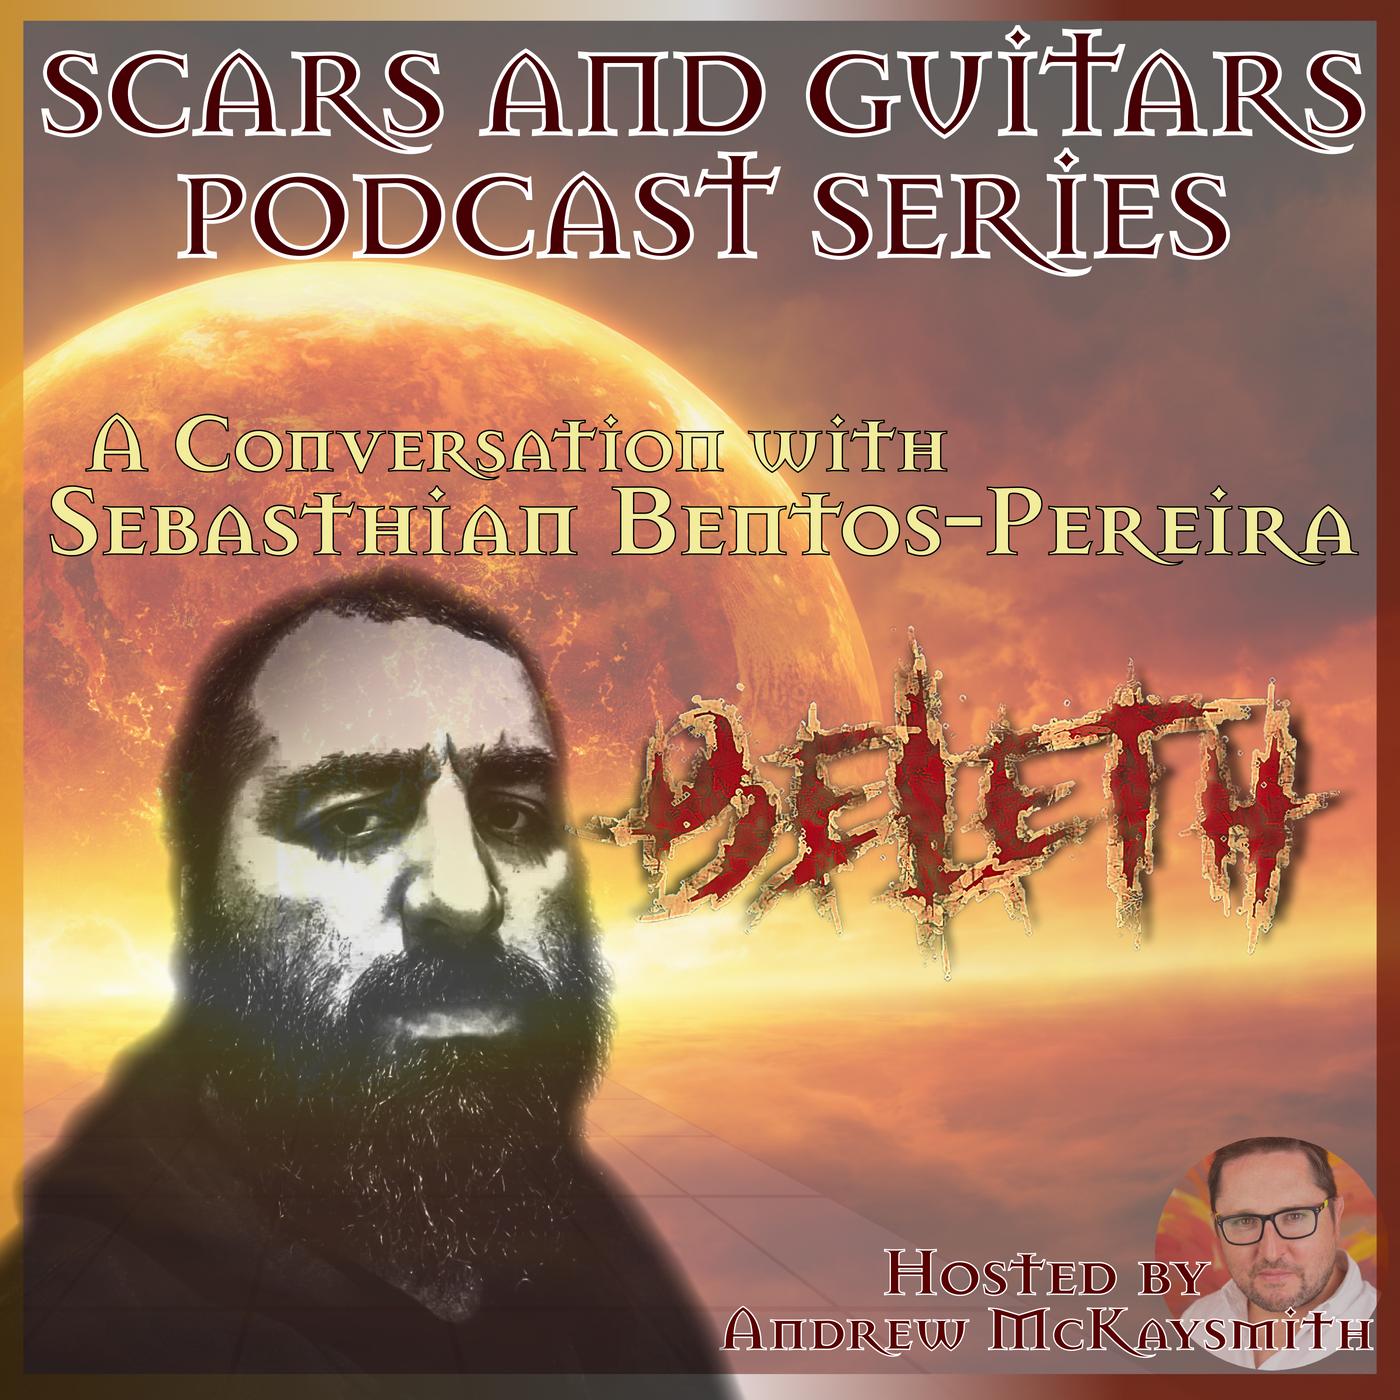 Sebasthian Bentos-Pereira (Beleth)